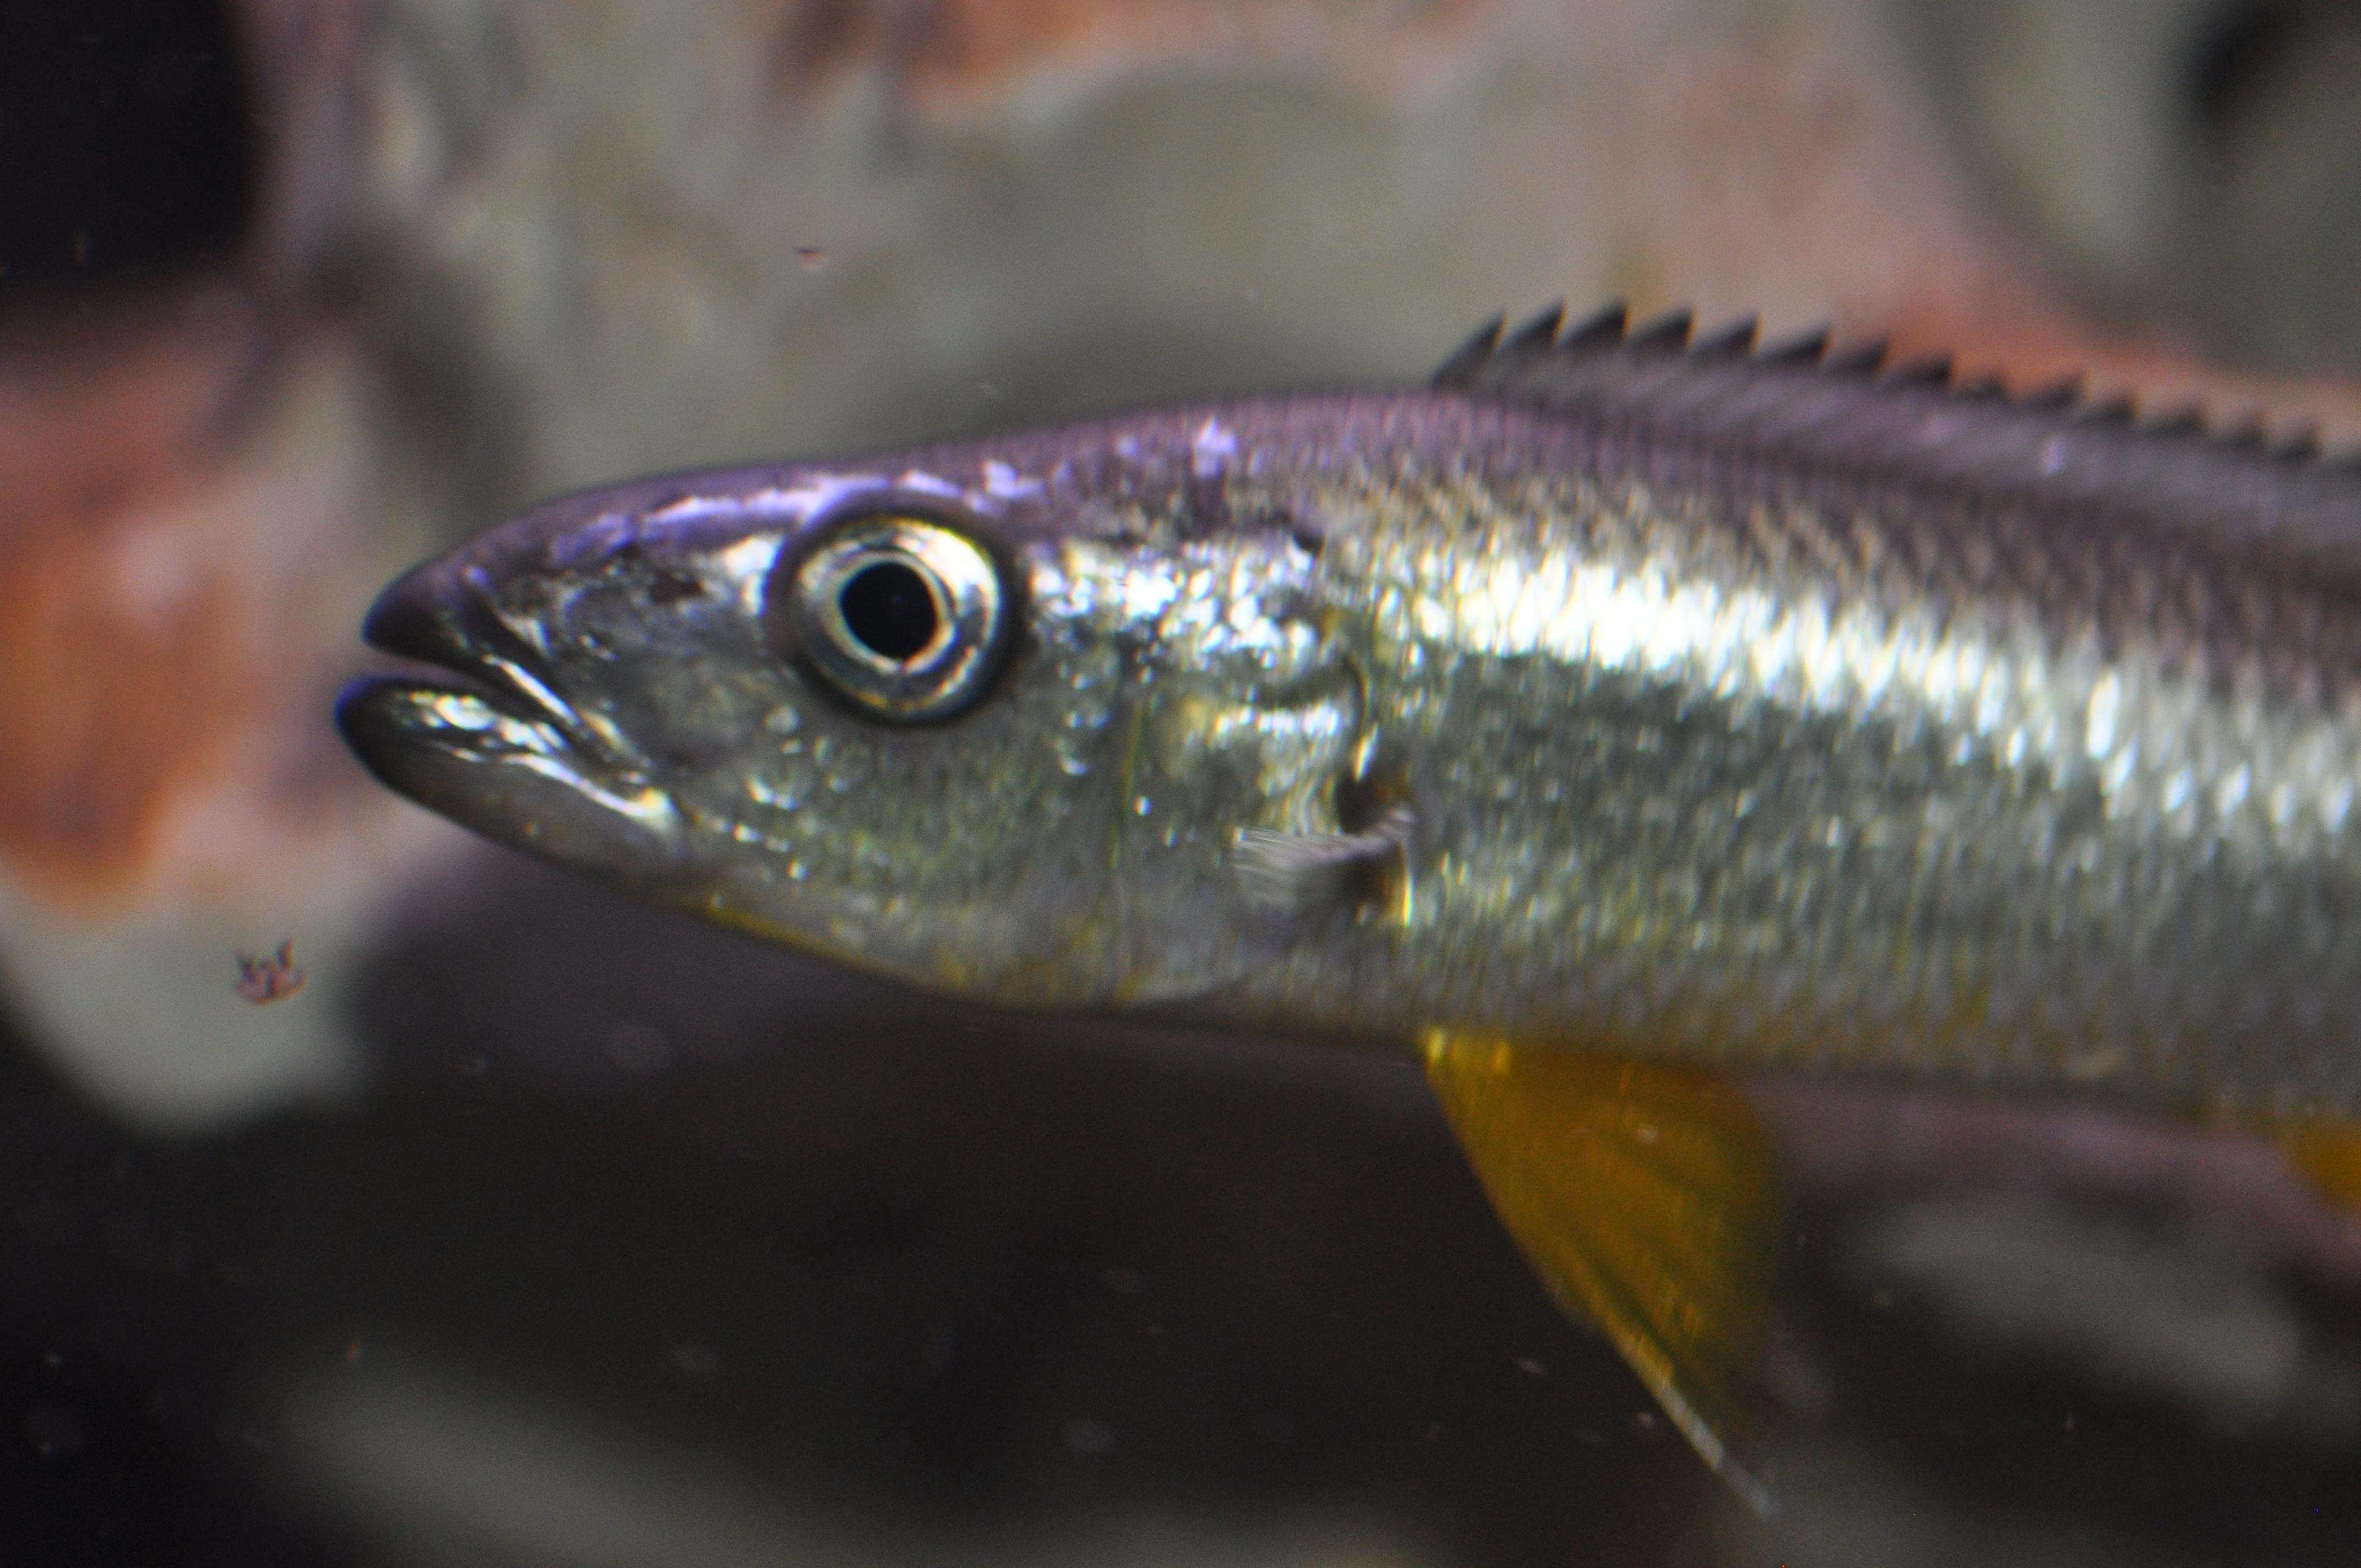 cichlids.com: Rhamphochromis macrophthalmus